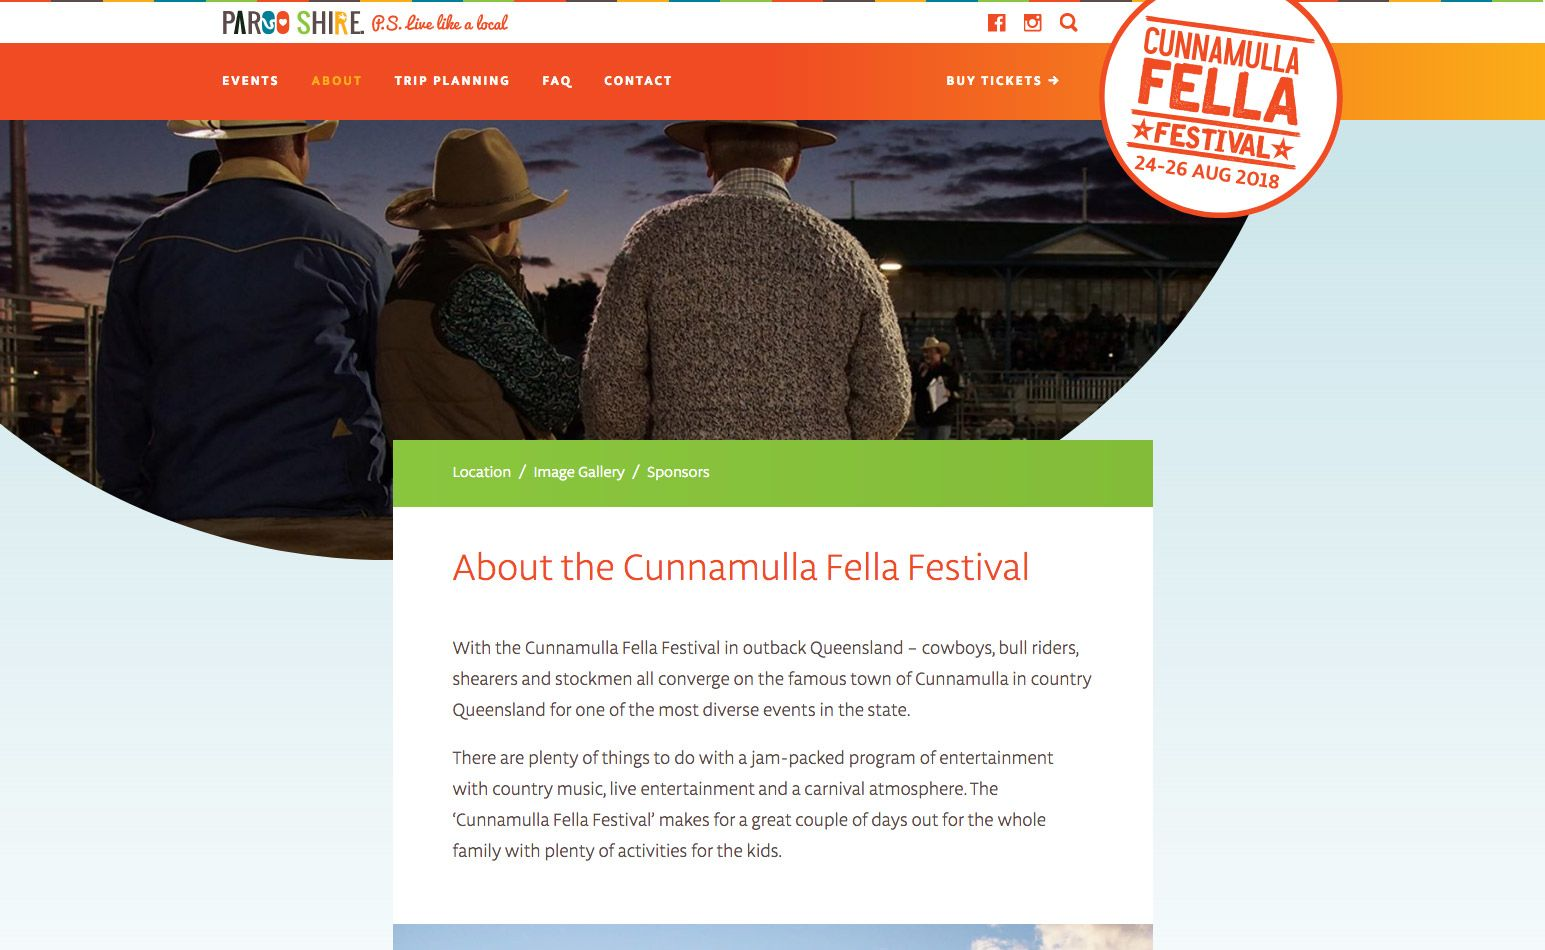 Cunnamulla Fella Festival Website